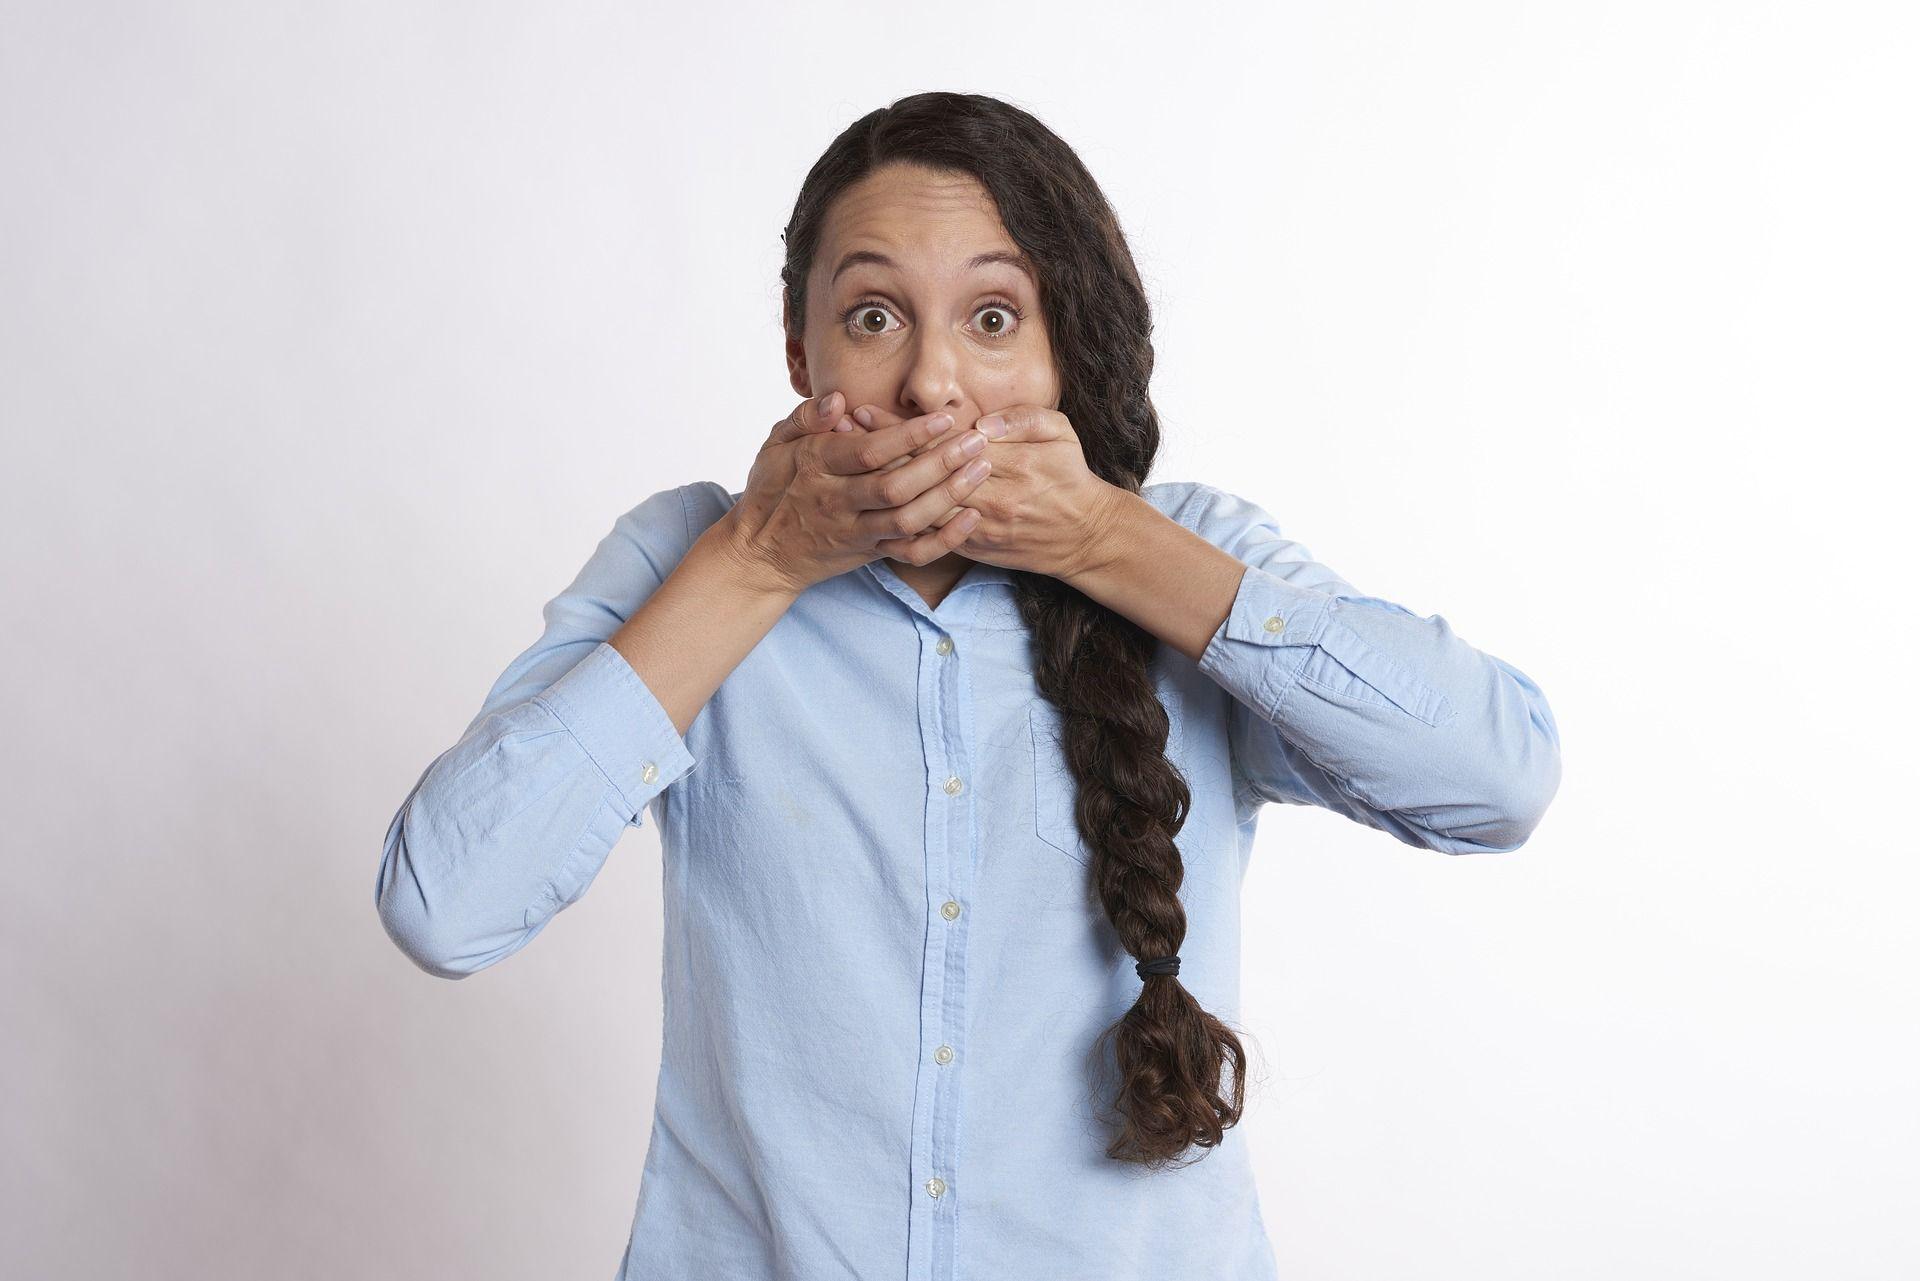 Halena (halitoza) sau respirația urât mirositoare: care sunt cauzele?